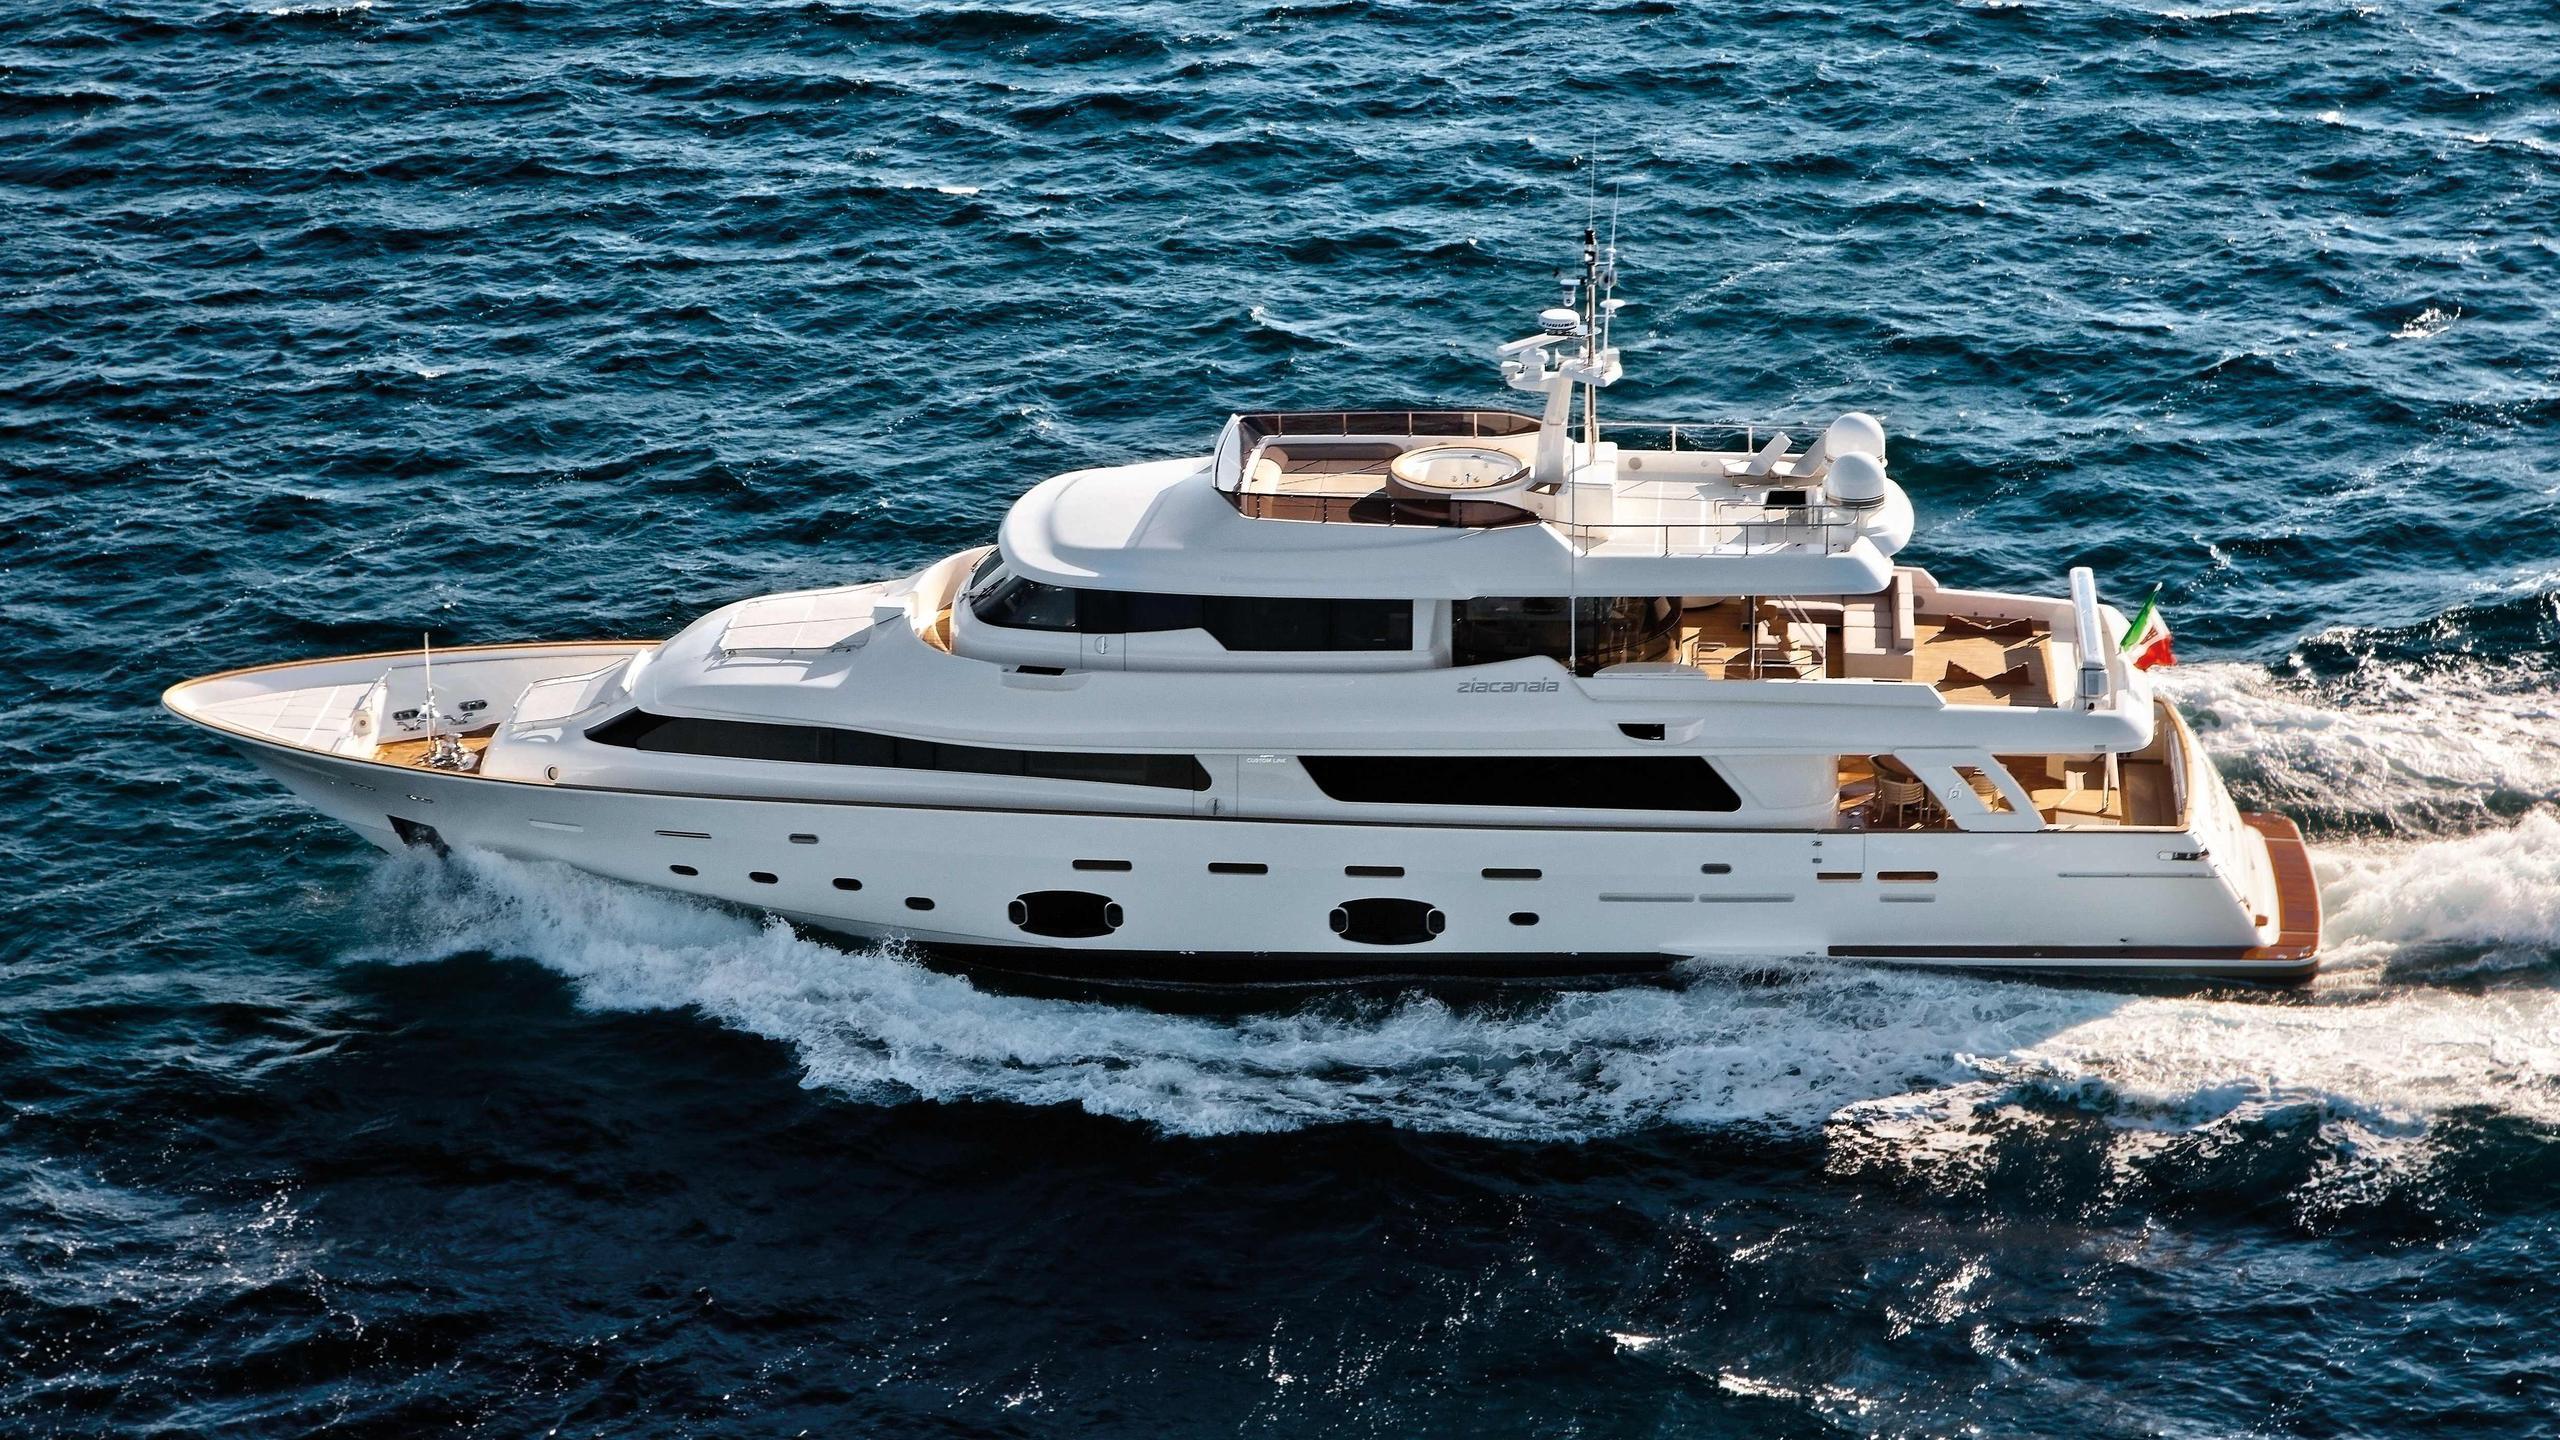 lady-zoya-motor-yacht-ferretti-custom-line-2015-33m-cruising